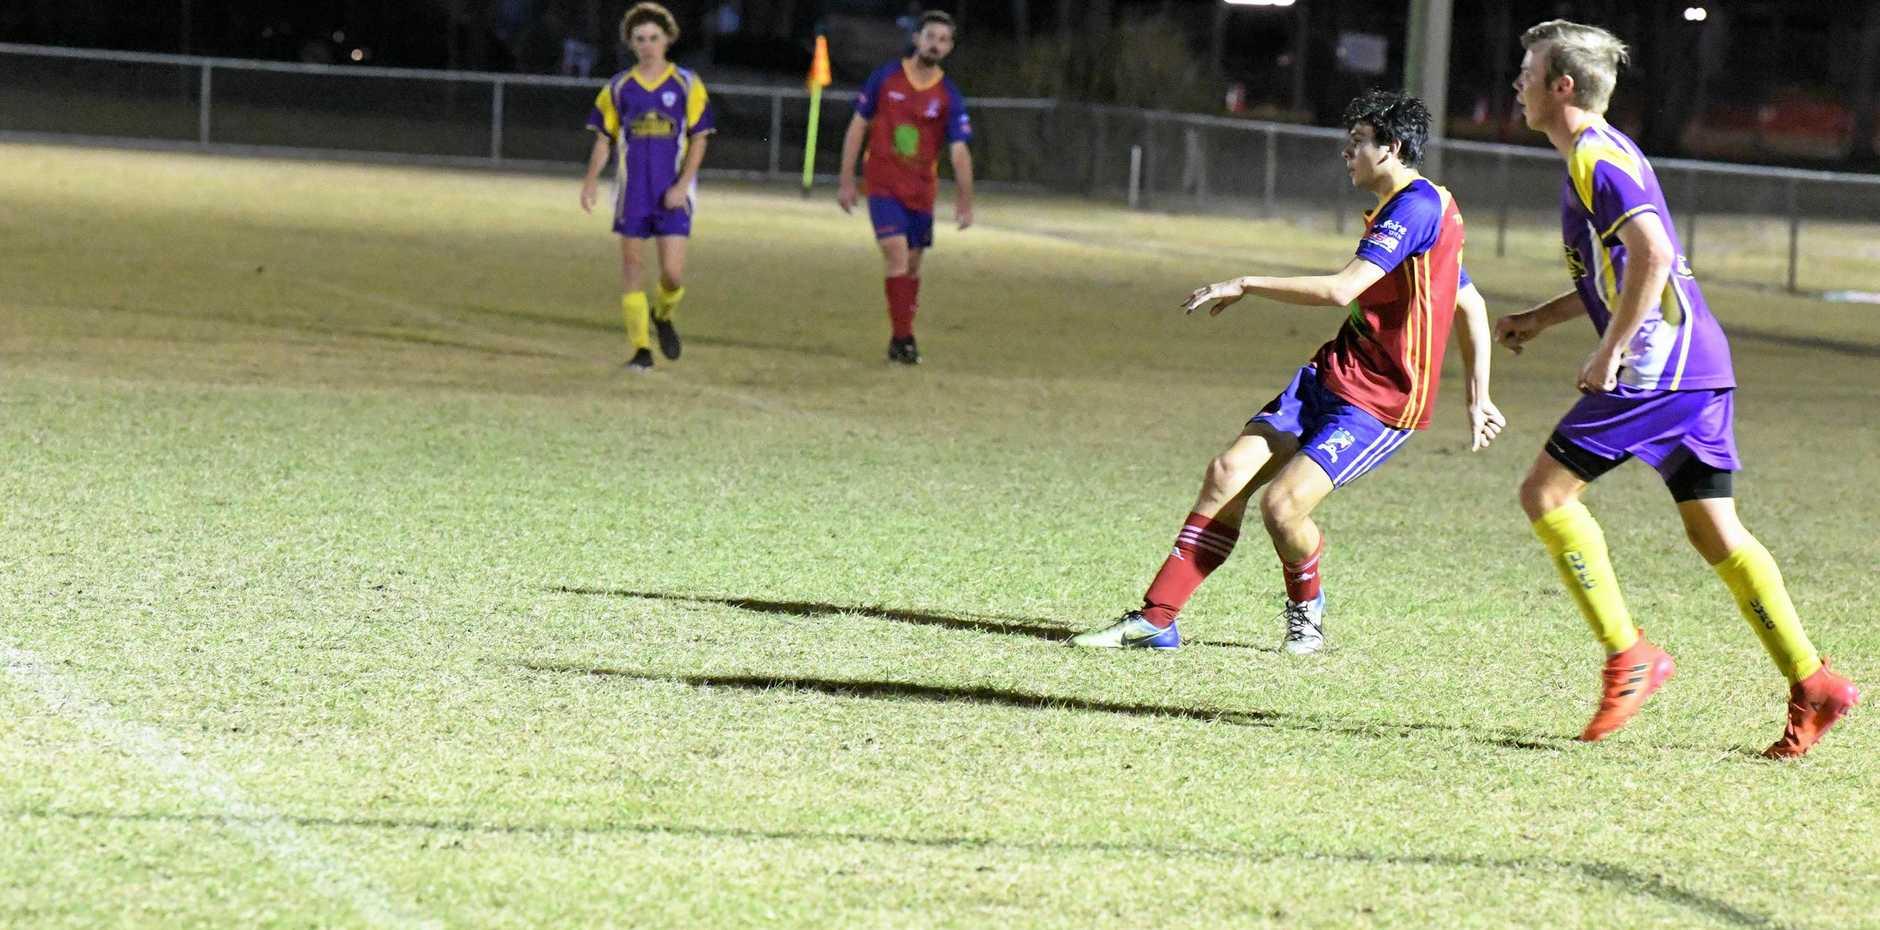 GOOD SHOT: Joshua Advaney watches his shot head towards the goal.